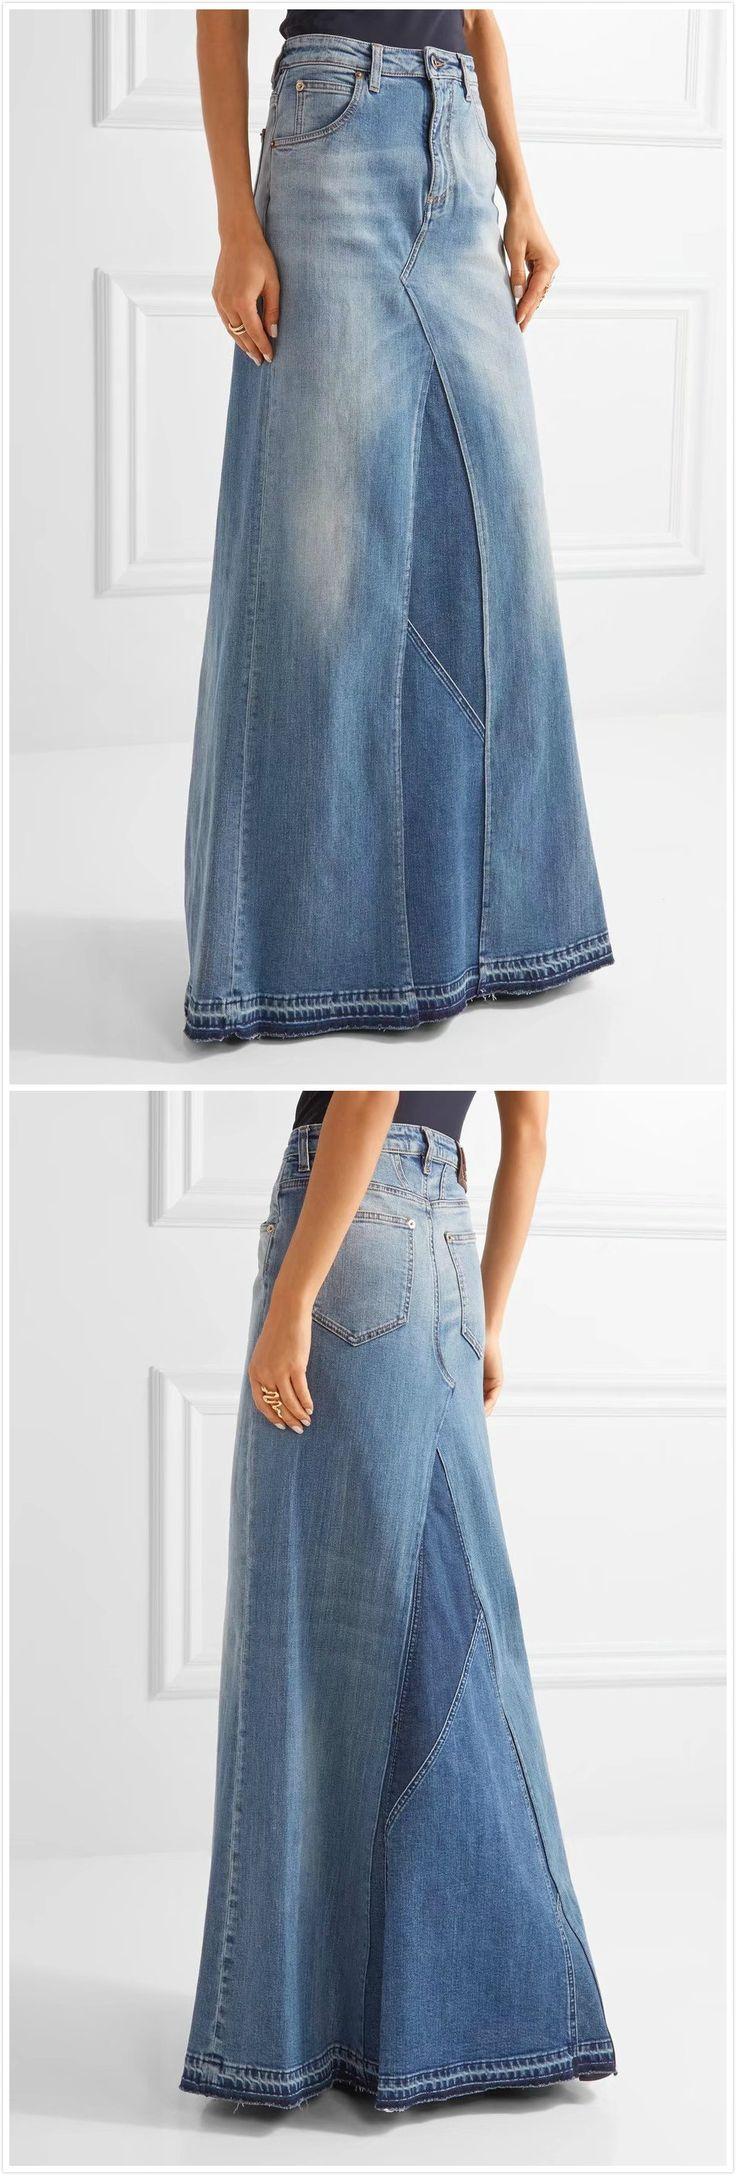 Fashion High Waist Maxi Denim Skirt